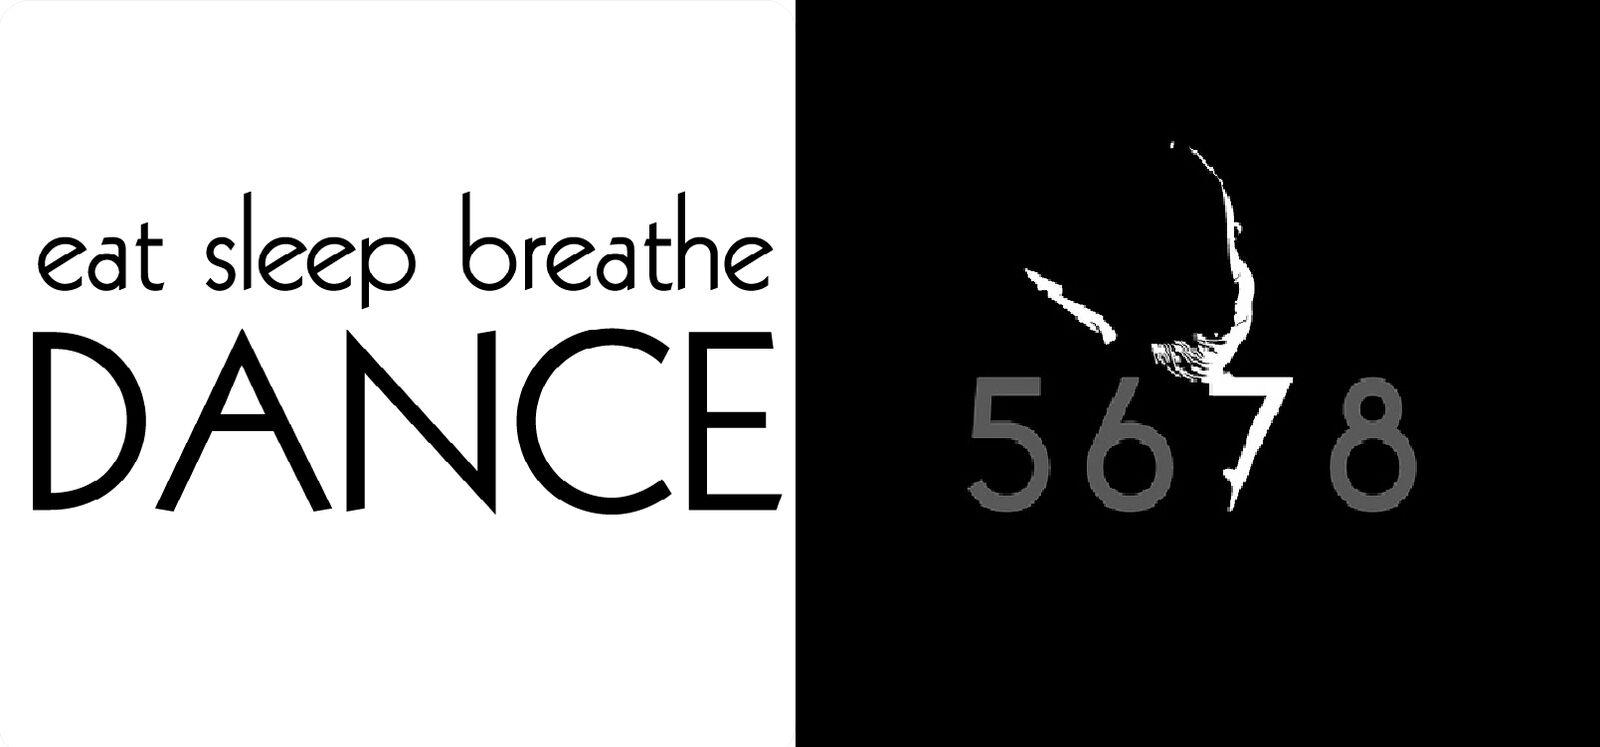 dance_5678_llc